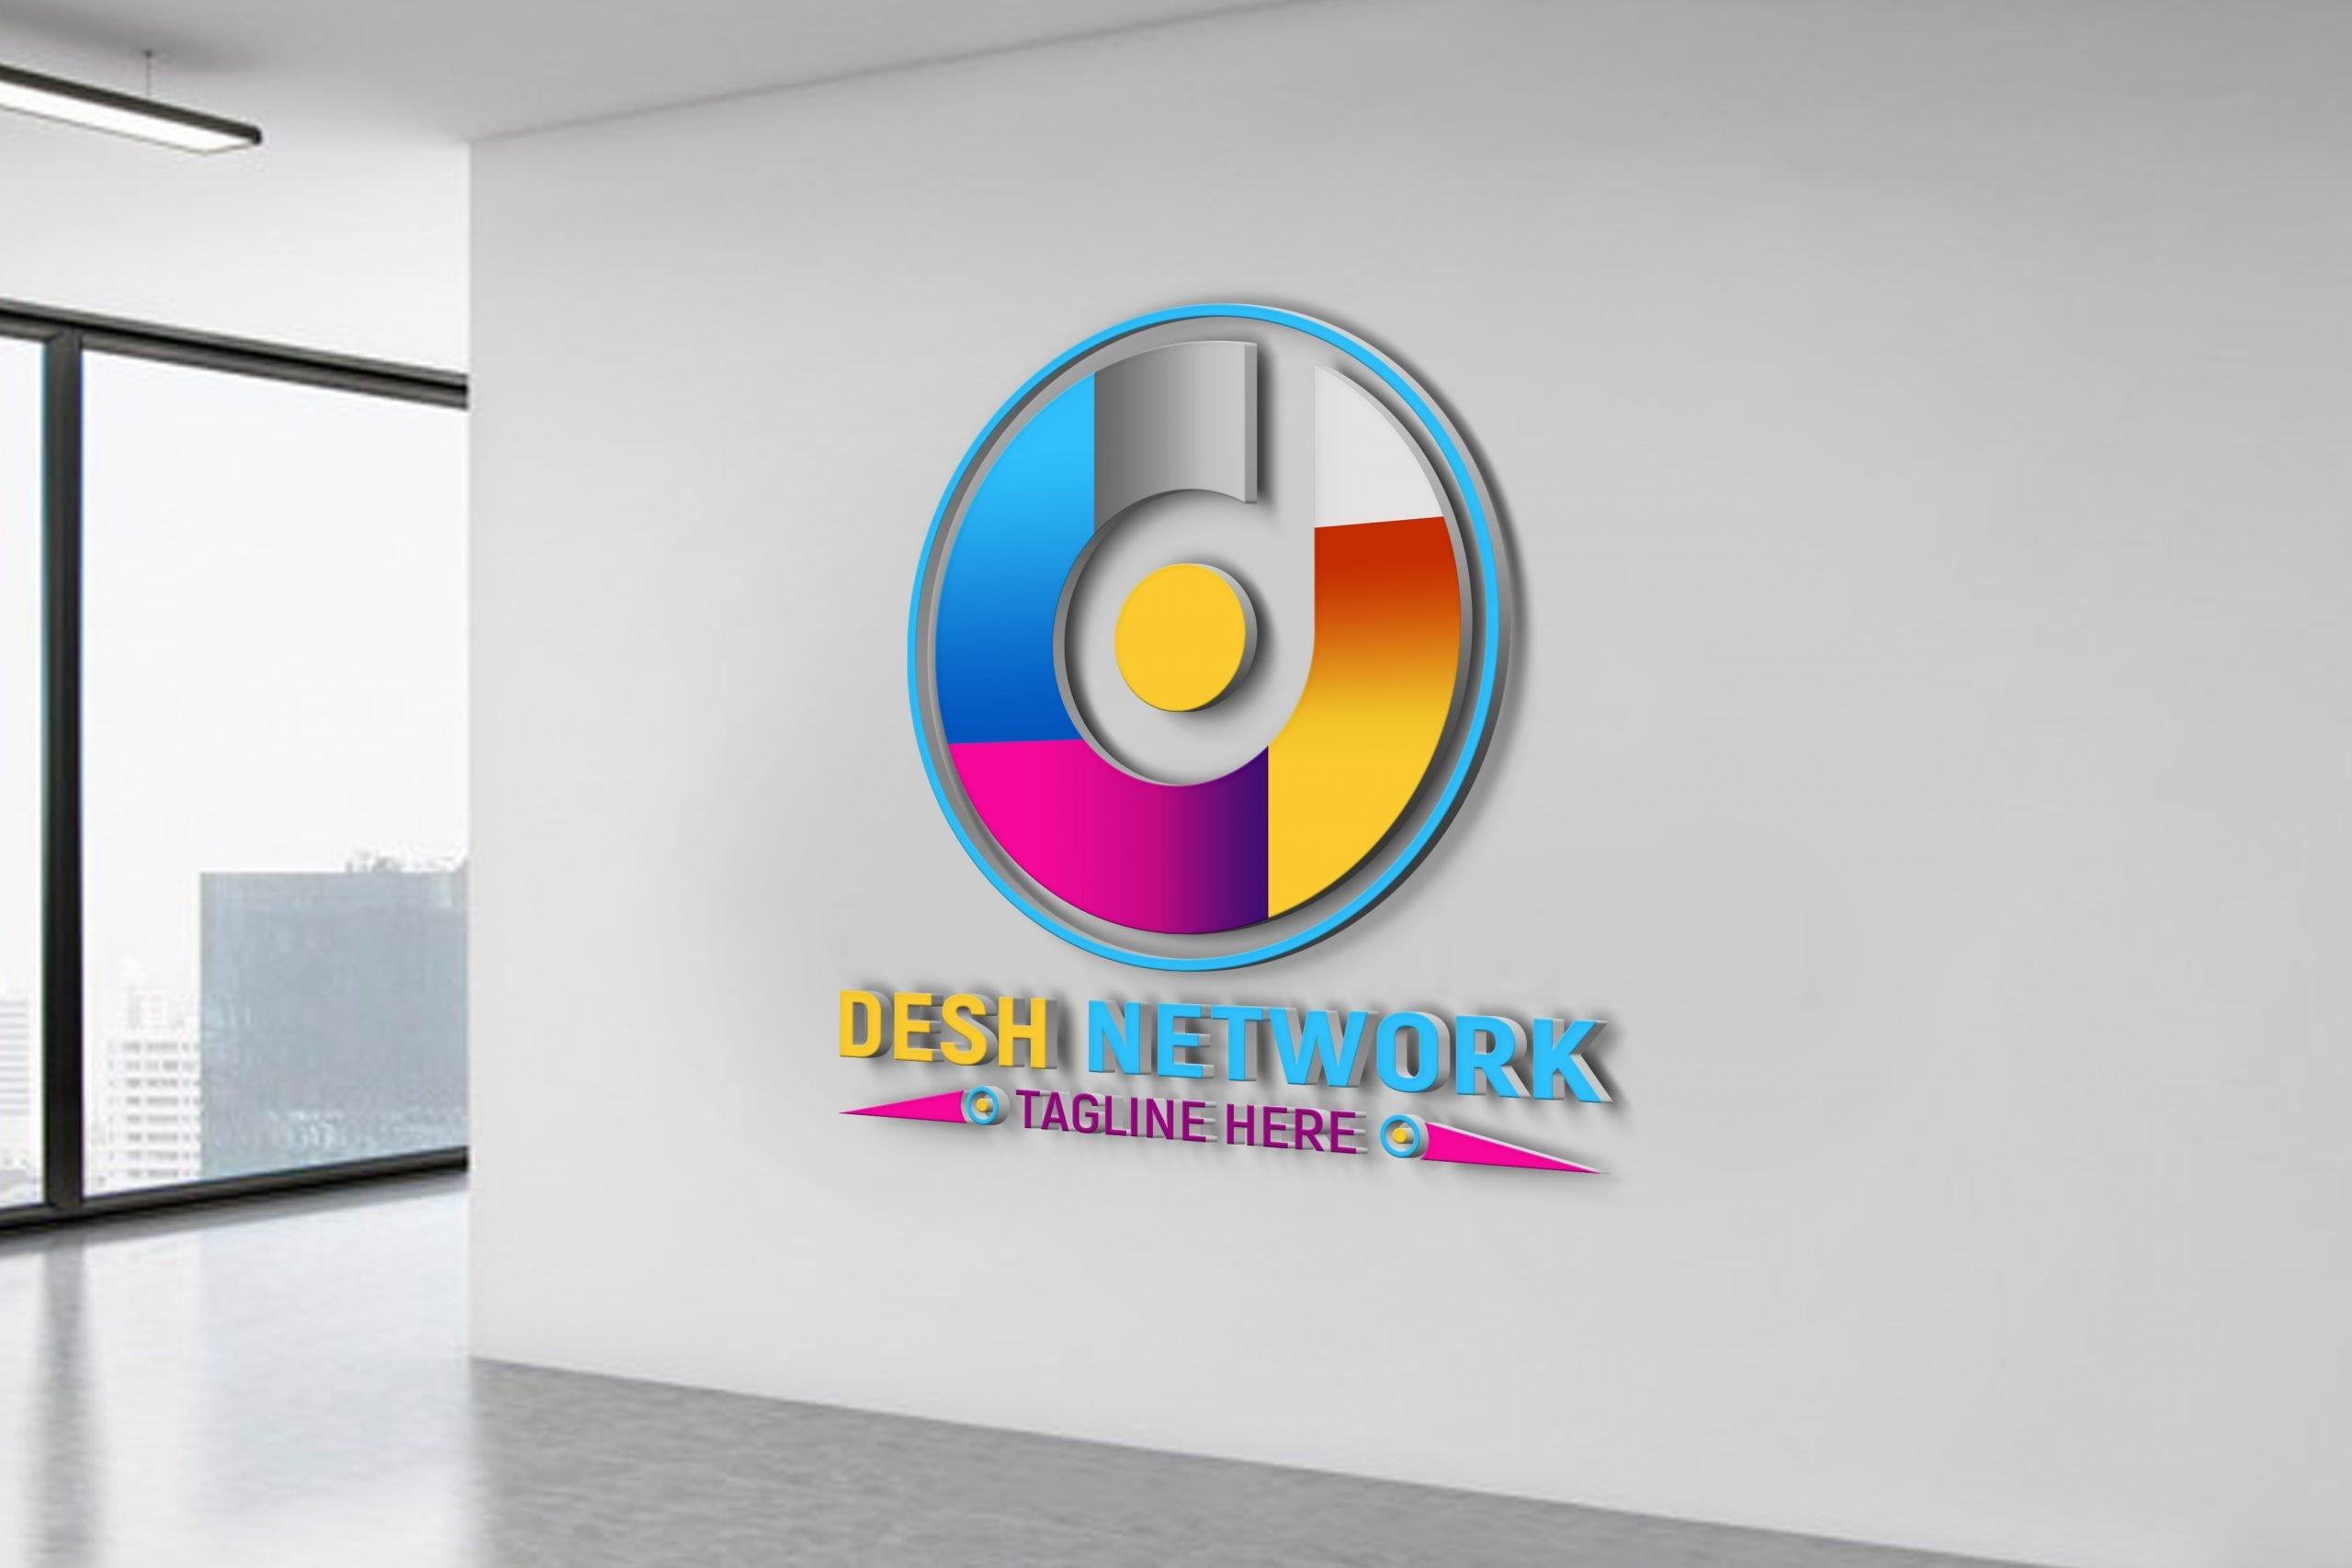 Free Download Editable Network Logo Design